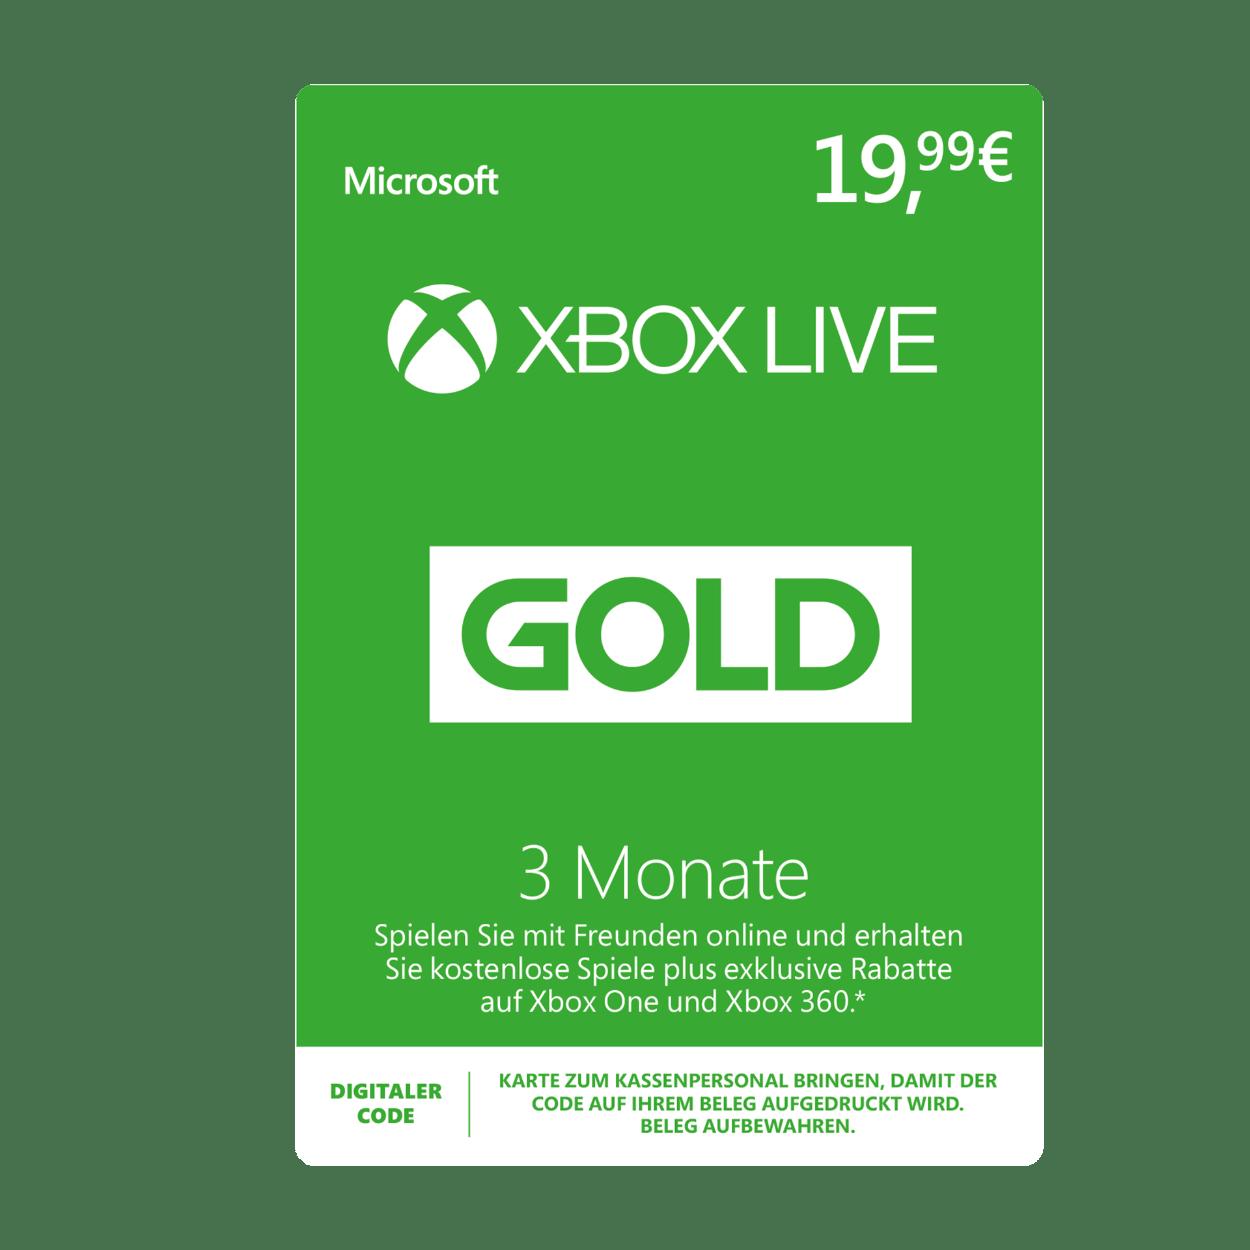 xbox live karte Microsoft Xbox Live Gold 3 Monate günstig bei ALDI Nord